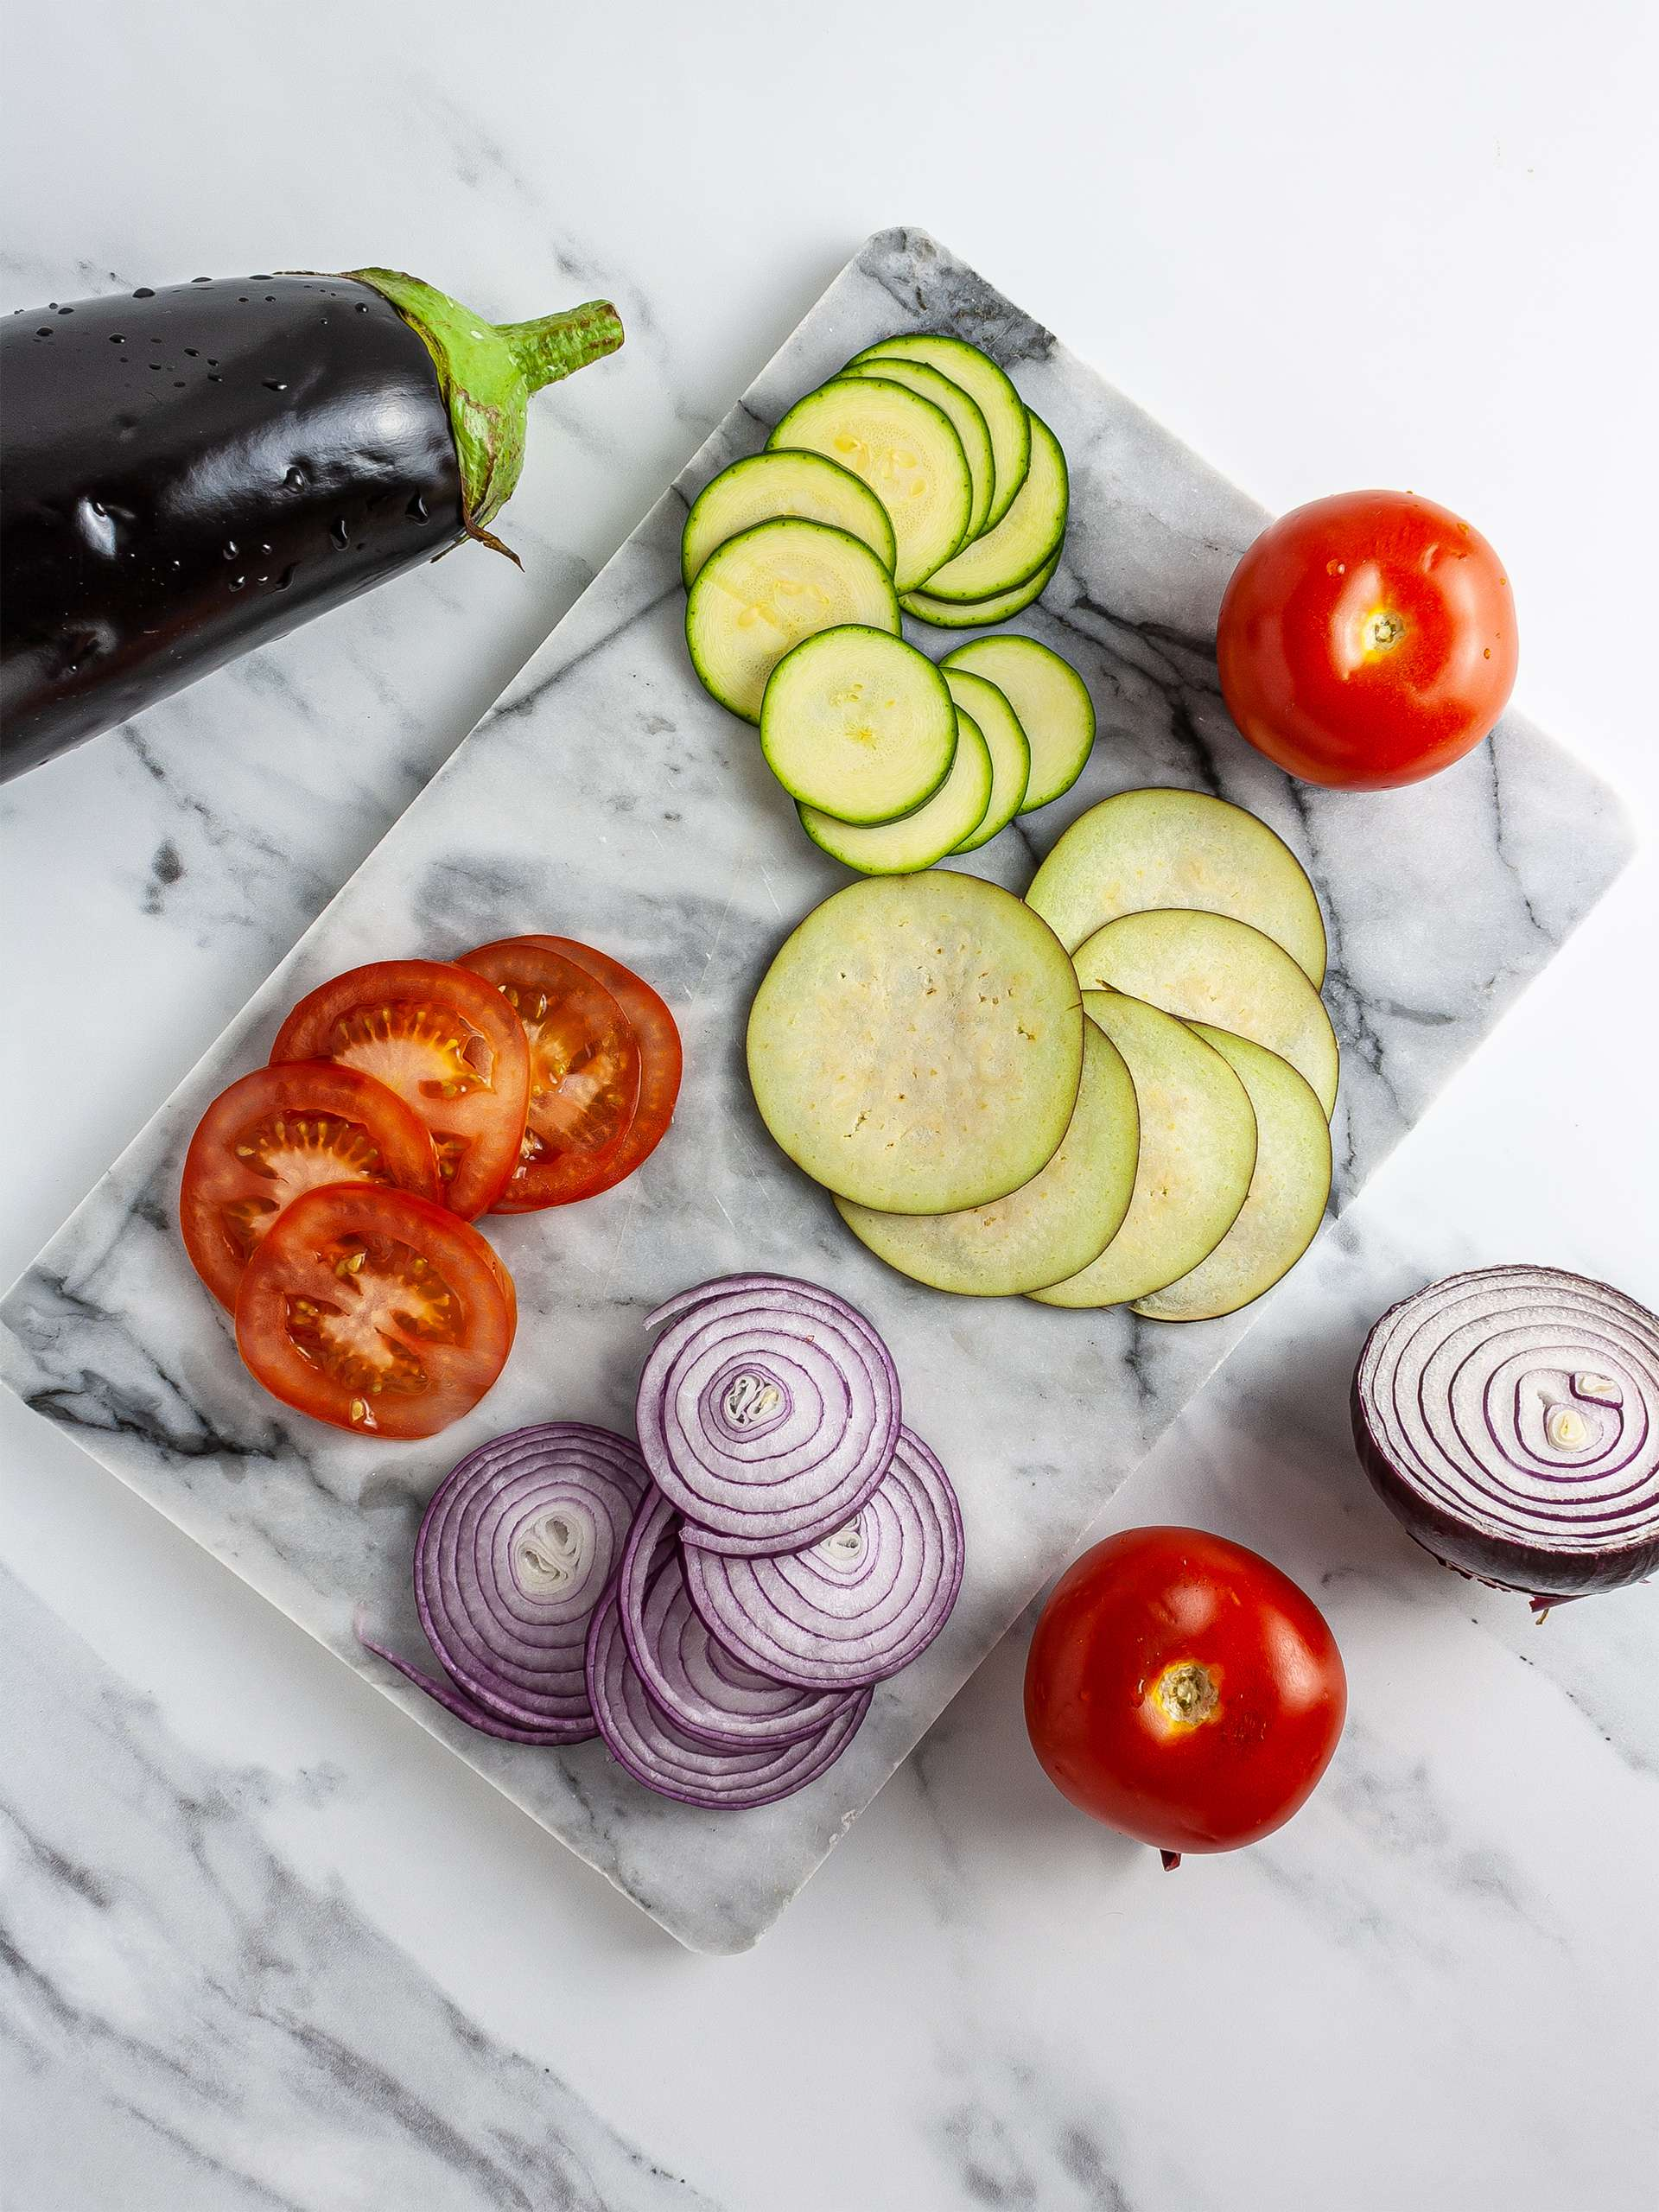 Sliced eggplants, zucchini, onions, and tomatoes